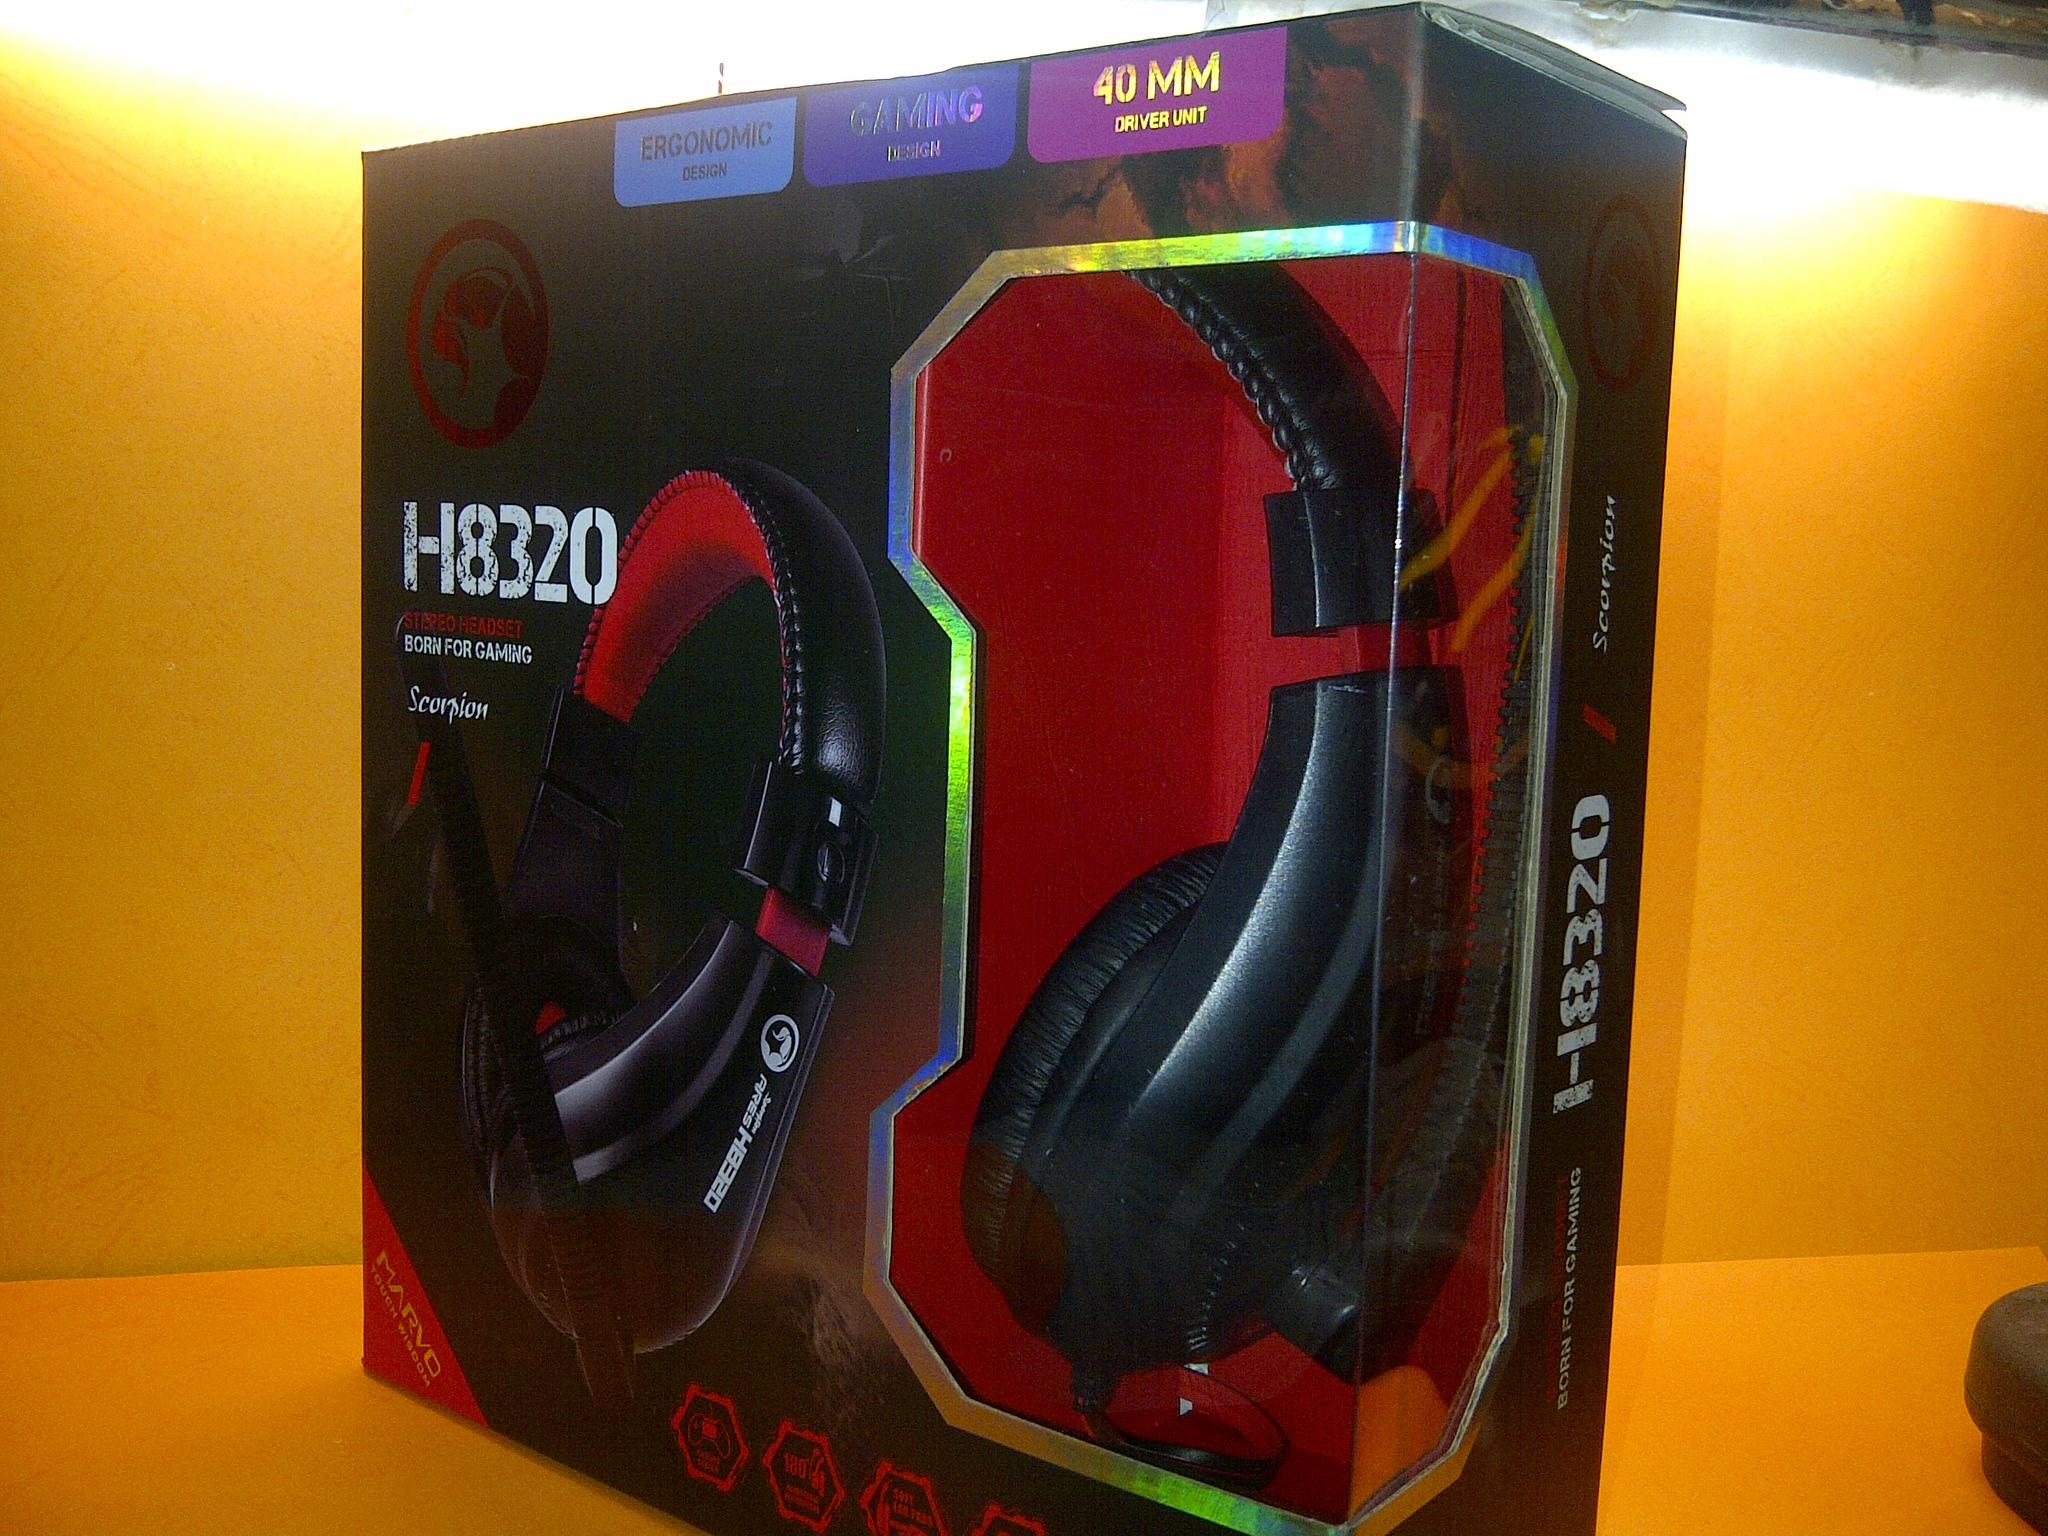 Marvo H8629 H8329 Headset Gaming Hitam Daftar Harga Terbaru Dan Headseet Jual Headphone H8320 Istimewa Yulyan83 Shop Tokopedia